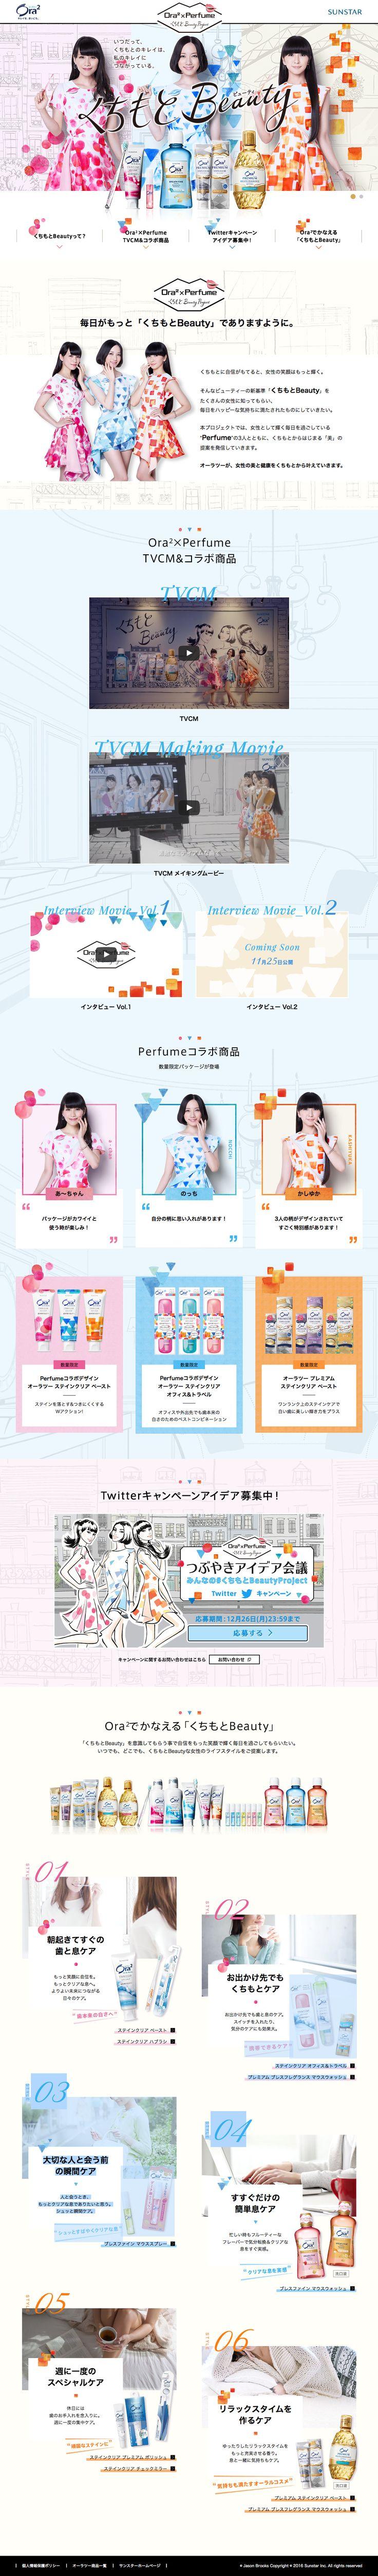 Ora2×Perfume くちもとBeauty Project http://ora2-perfume.com/